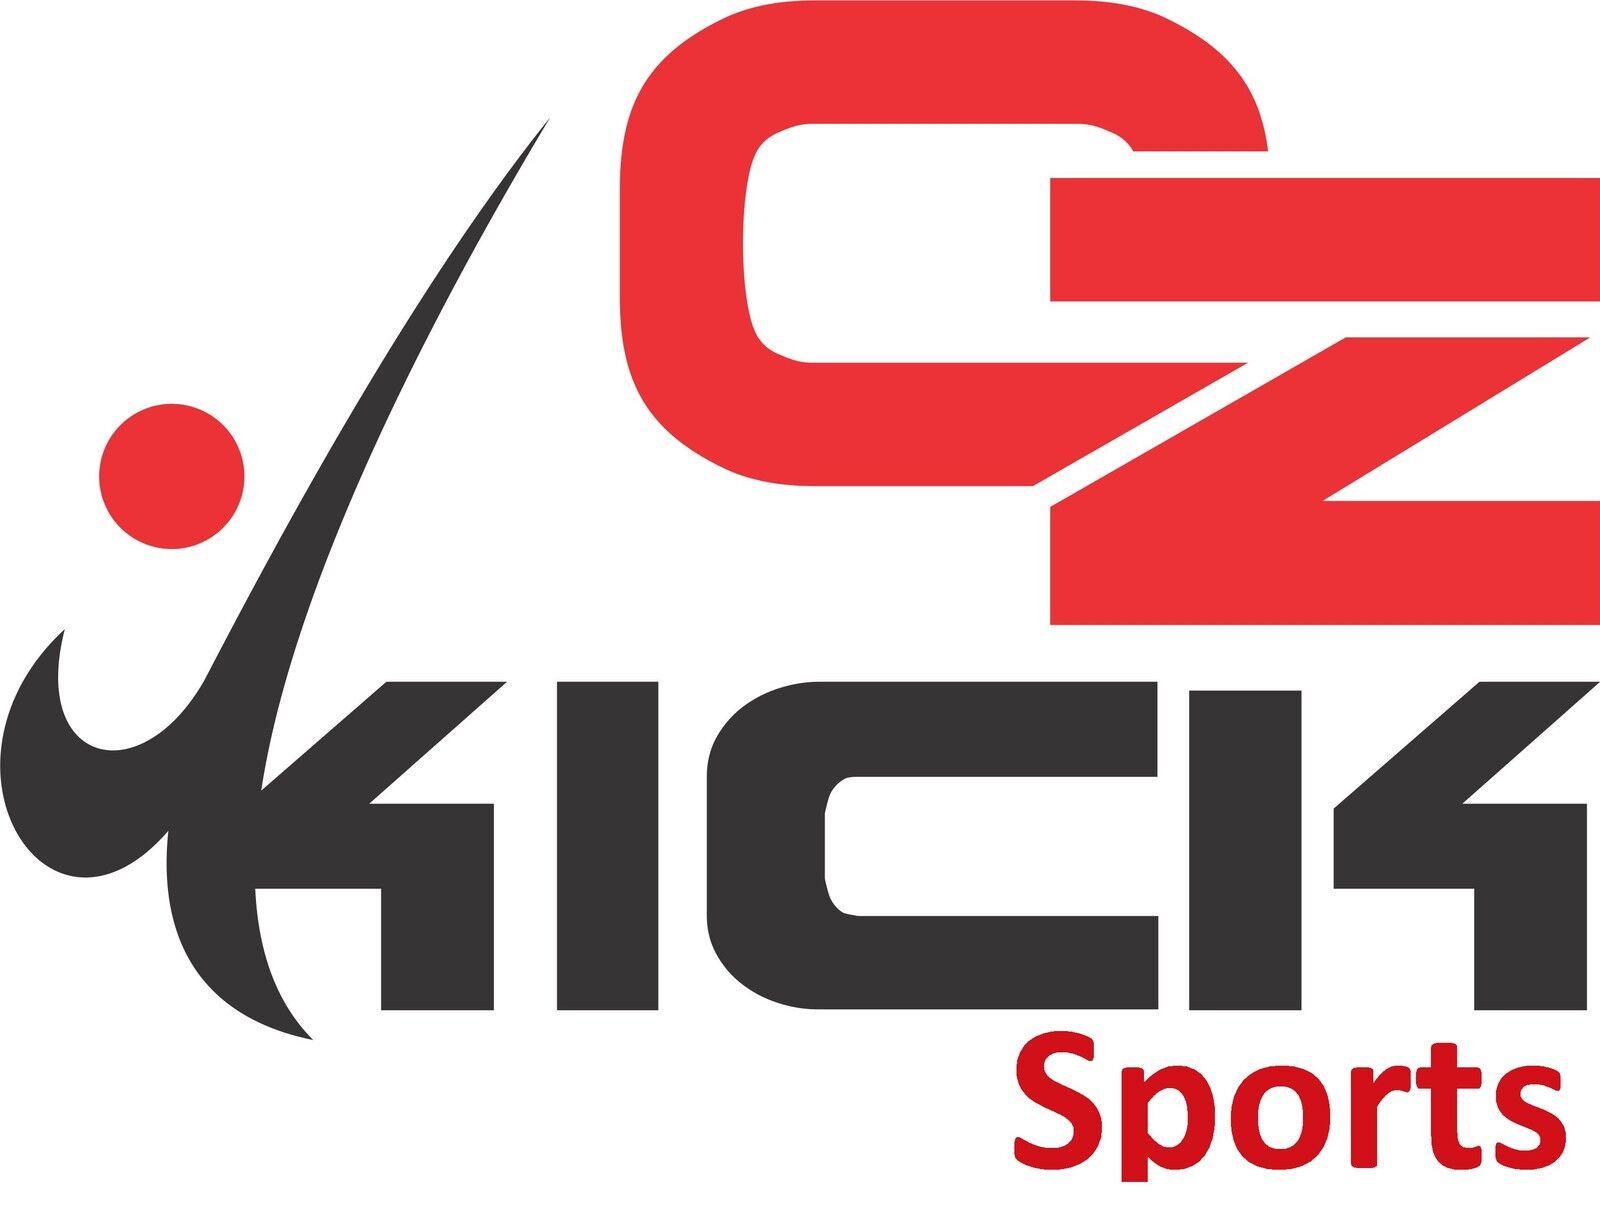 Ozkicksports